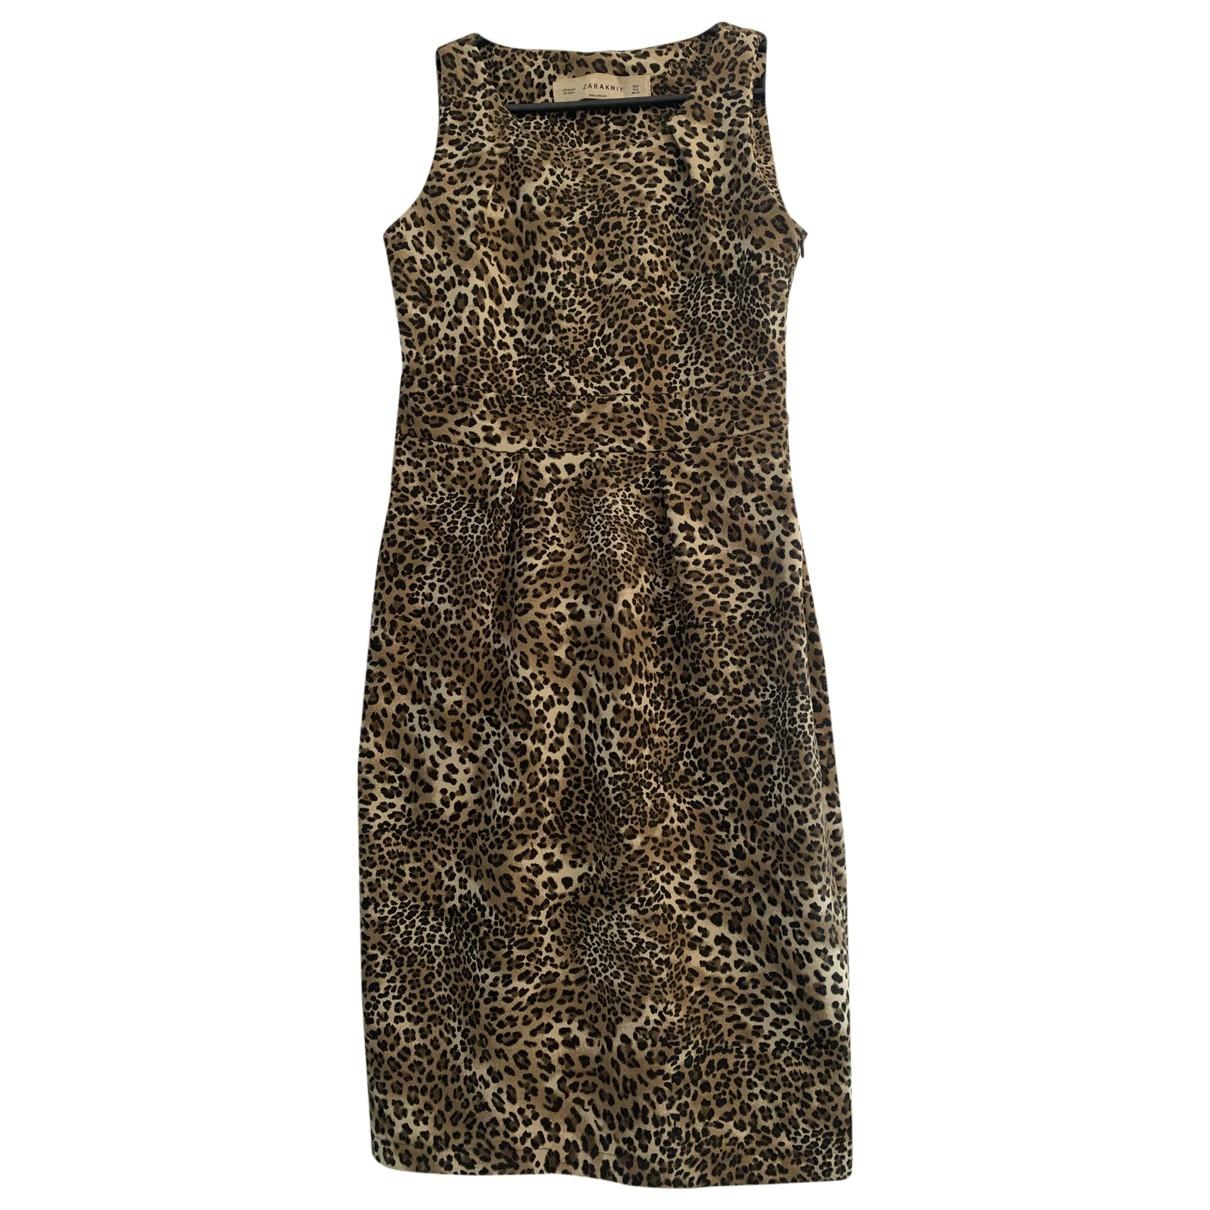 Zara \N Camel dress for Women S International